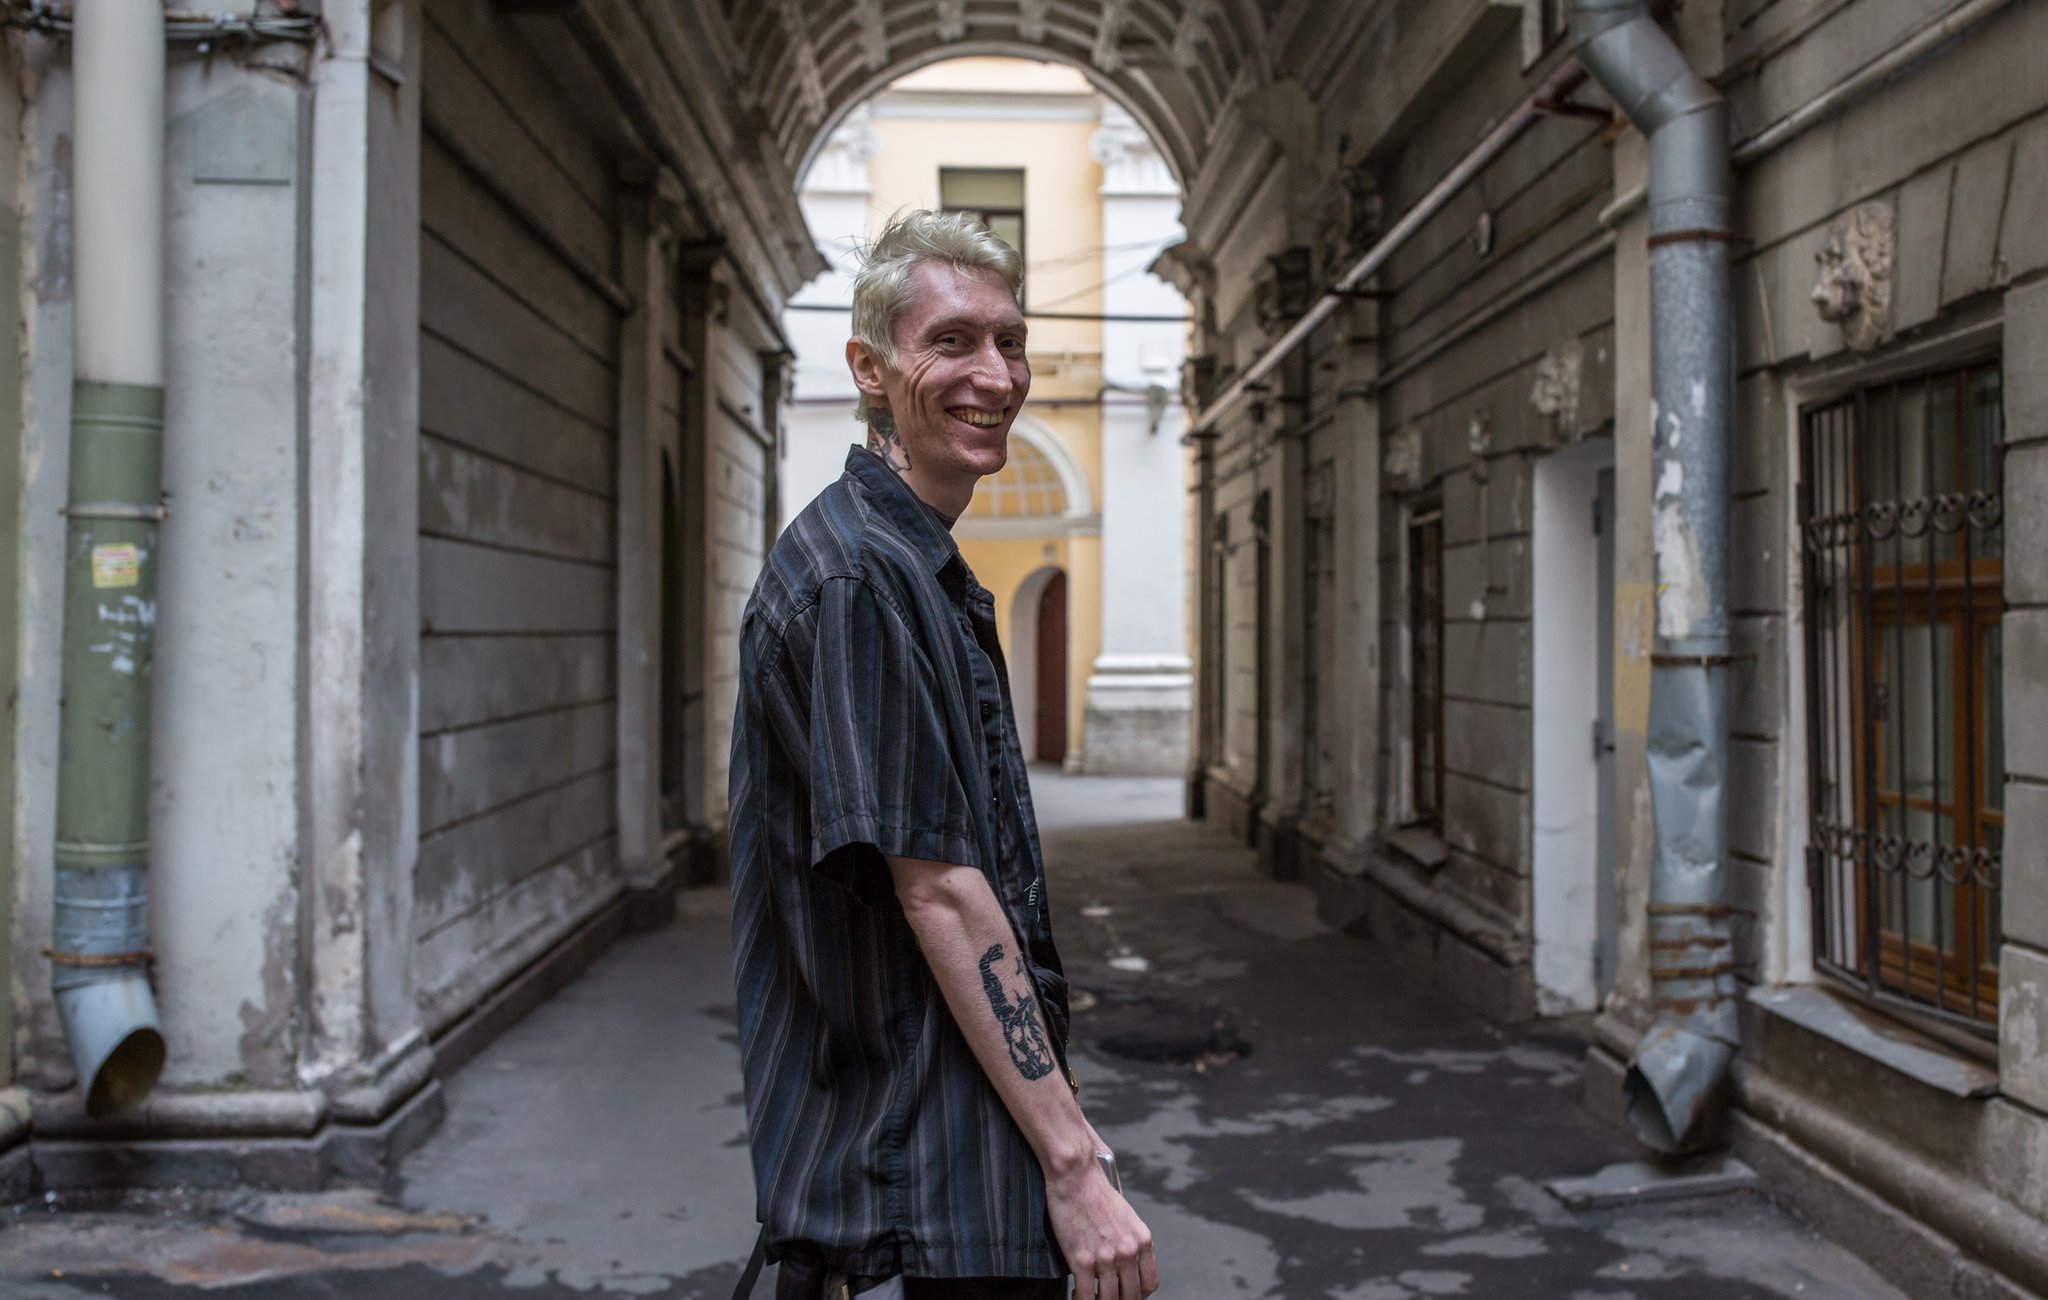 Kostya smiling beneath an archway